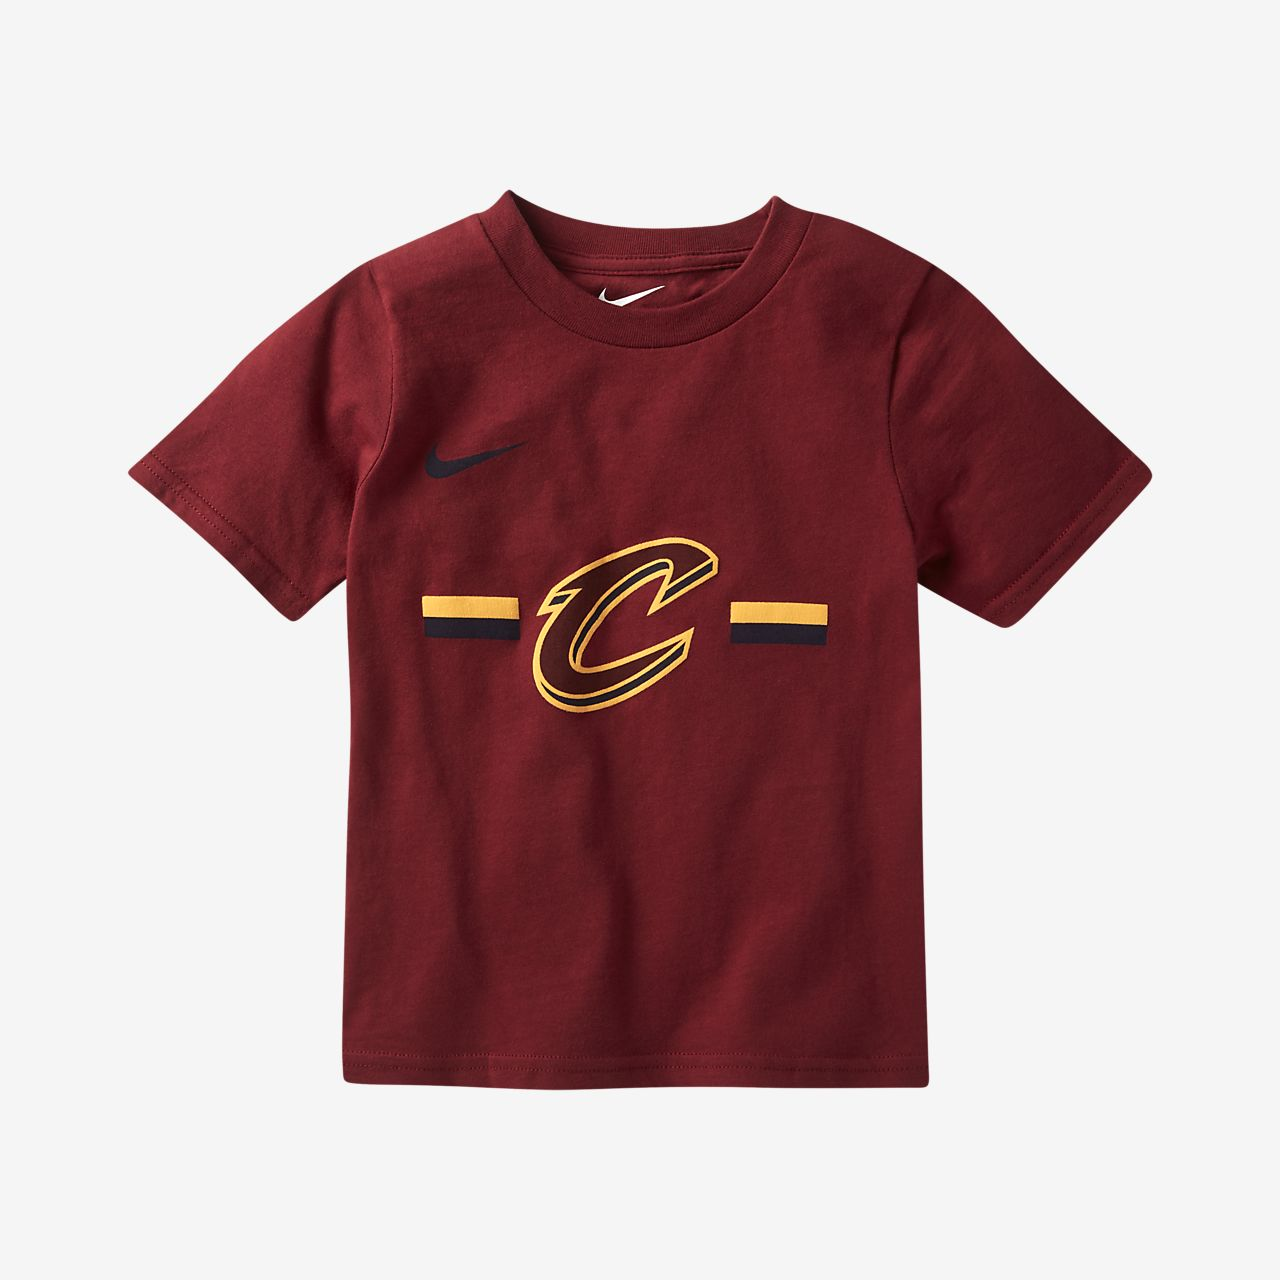 eceecda1 Cleveland Cavaliers Nike Logo Toddler NBA T-Shirt. Nike.com